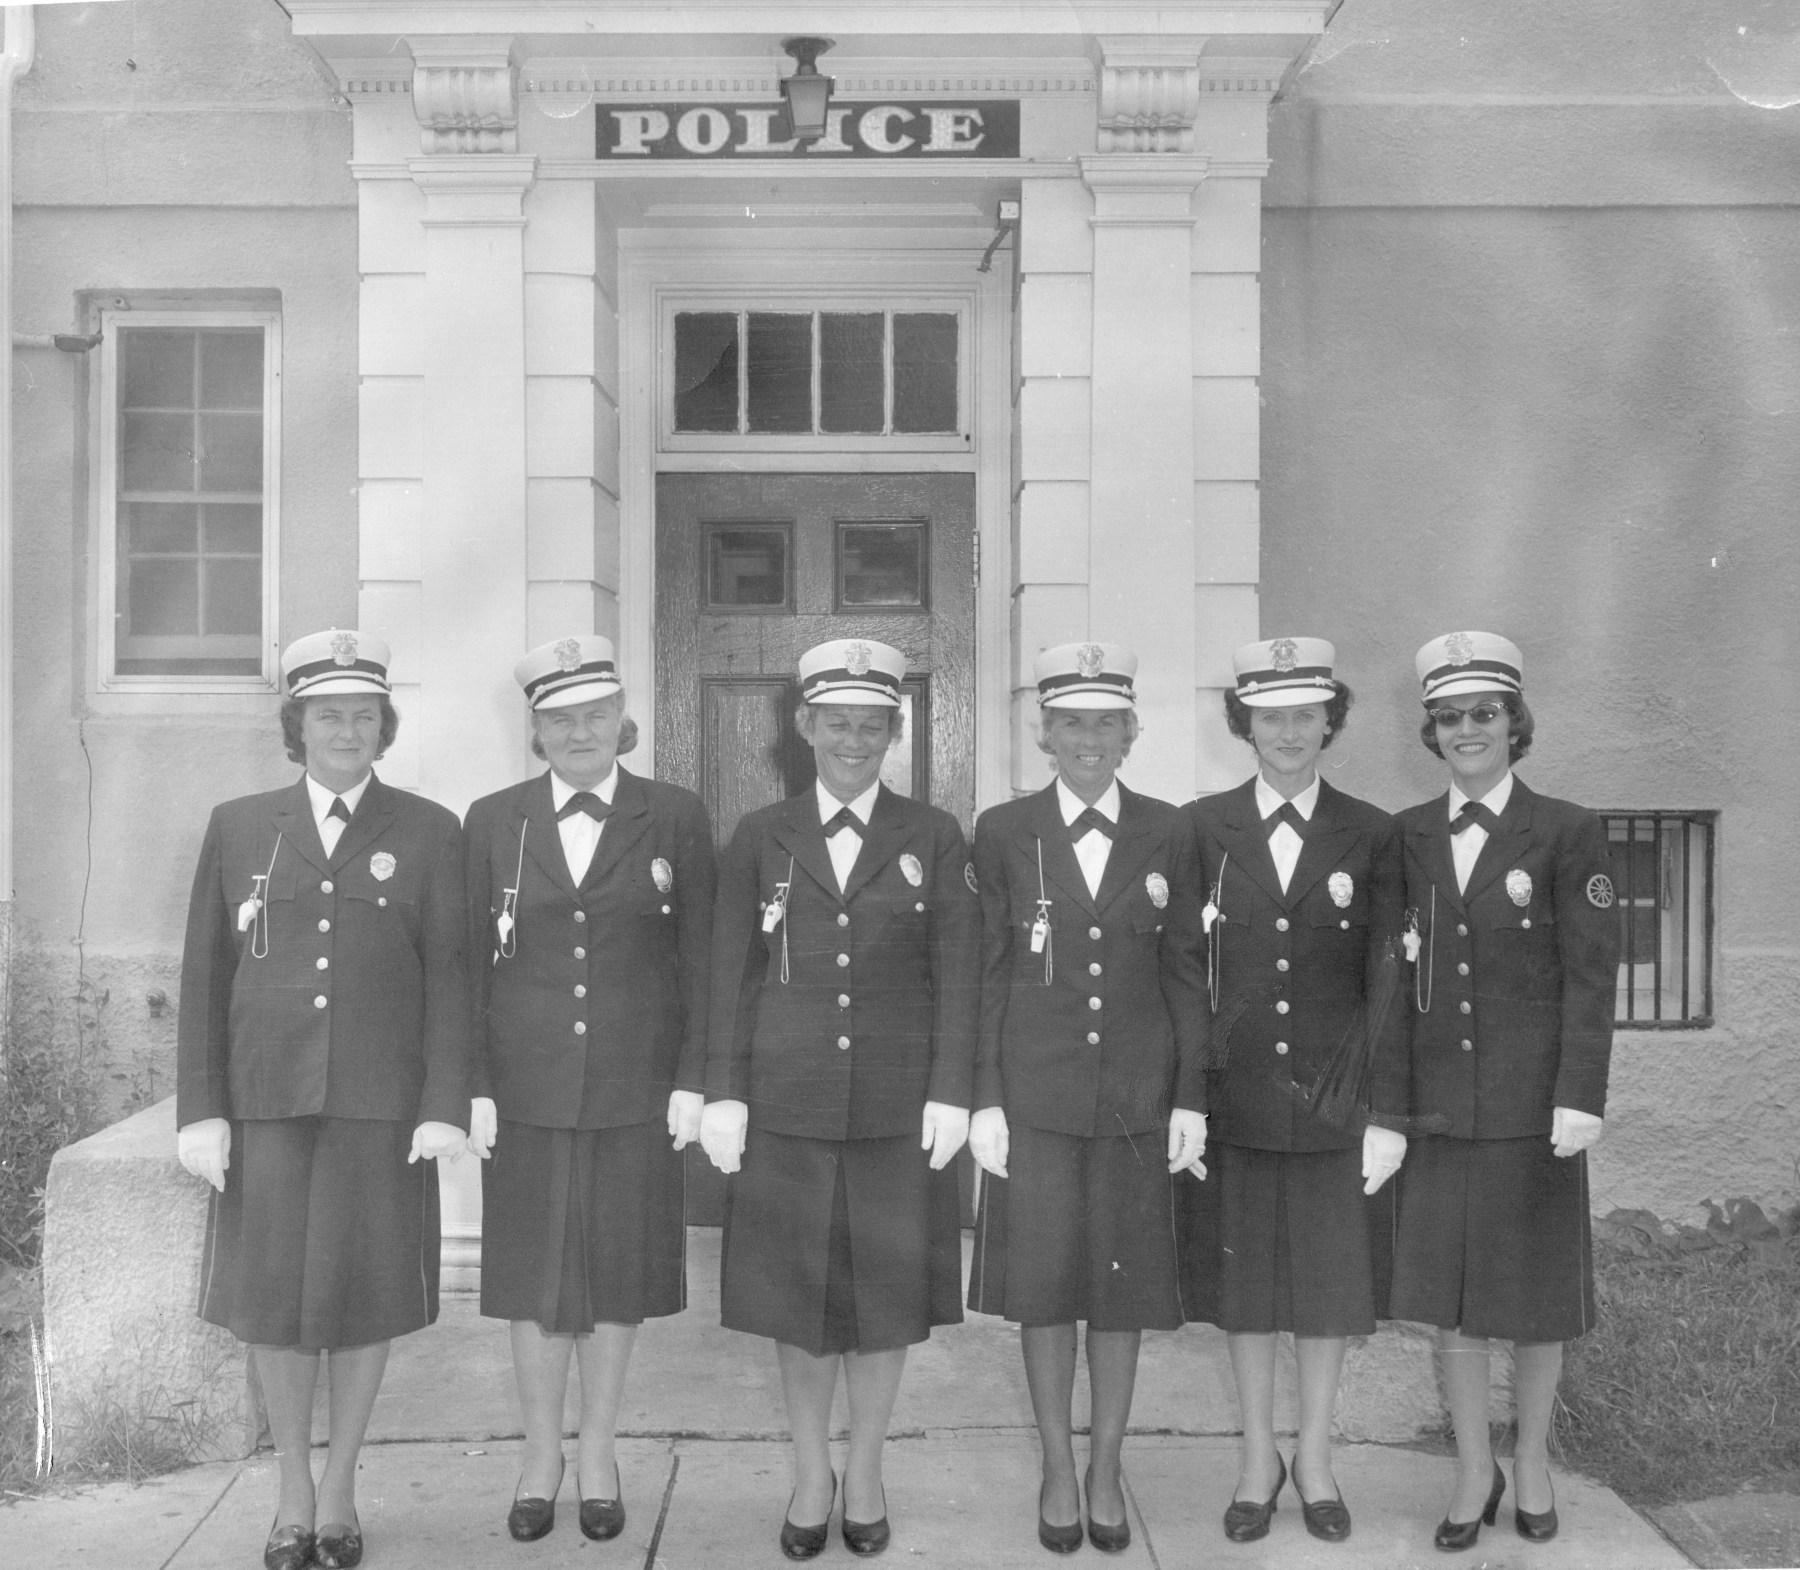 Burlington, MA police matrons, c. 1965. Photo credit: Maureen Putnam Paille.